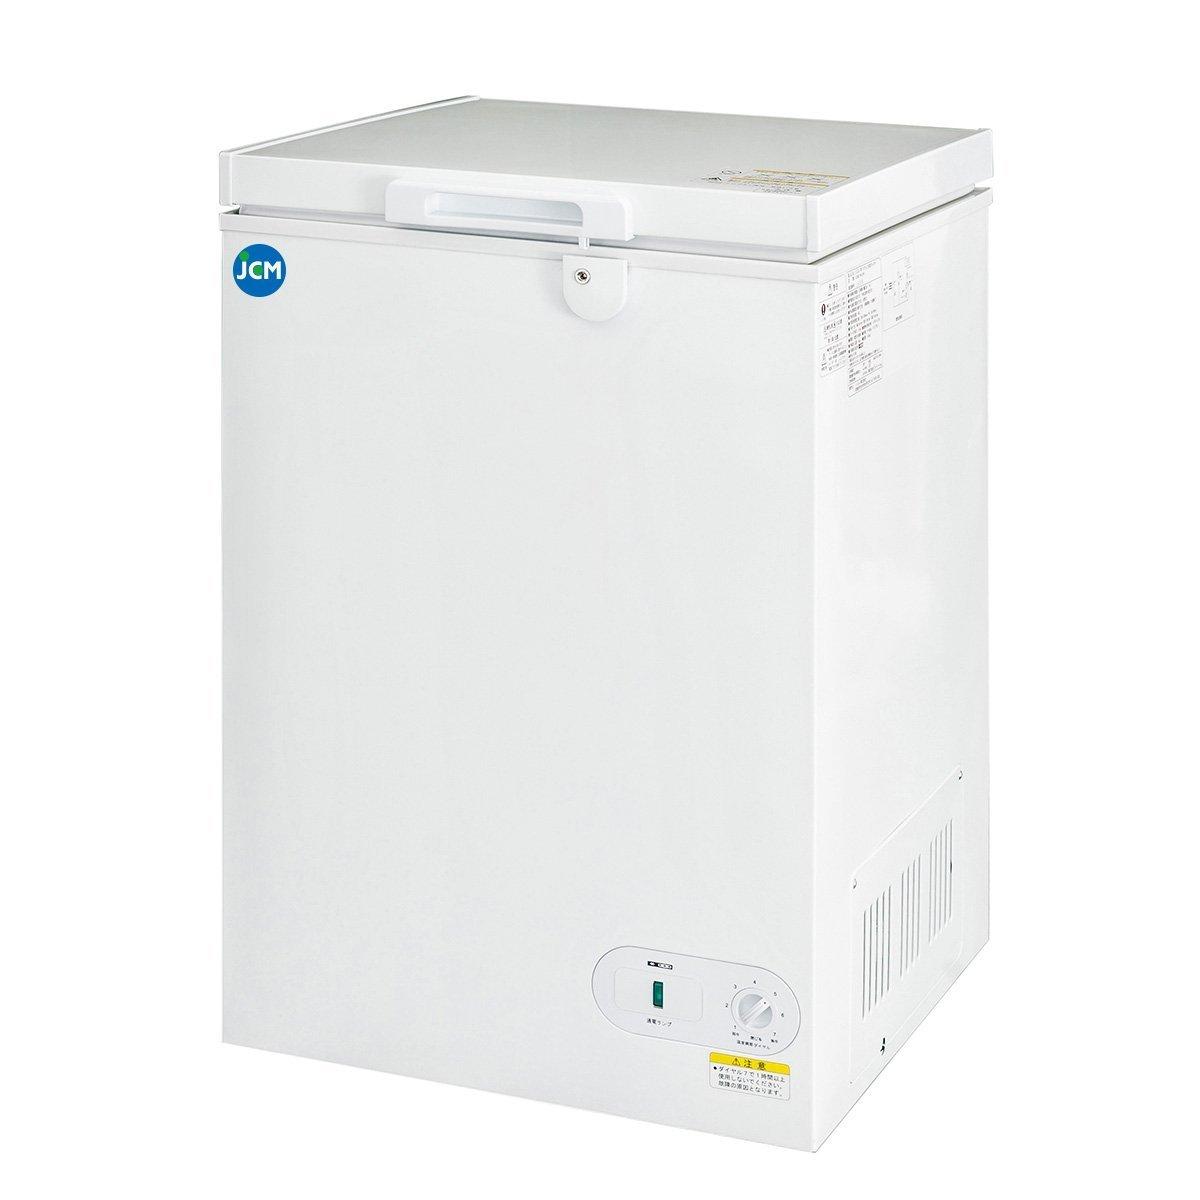 冷凍ストッカー B073PVVTGZ【JCMC-98】 JCMC-98 B073PVVTGZ, 岩内金物店:f35fb202 --- ijpba.info